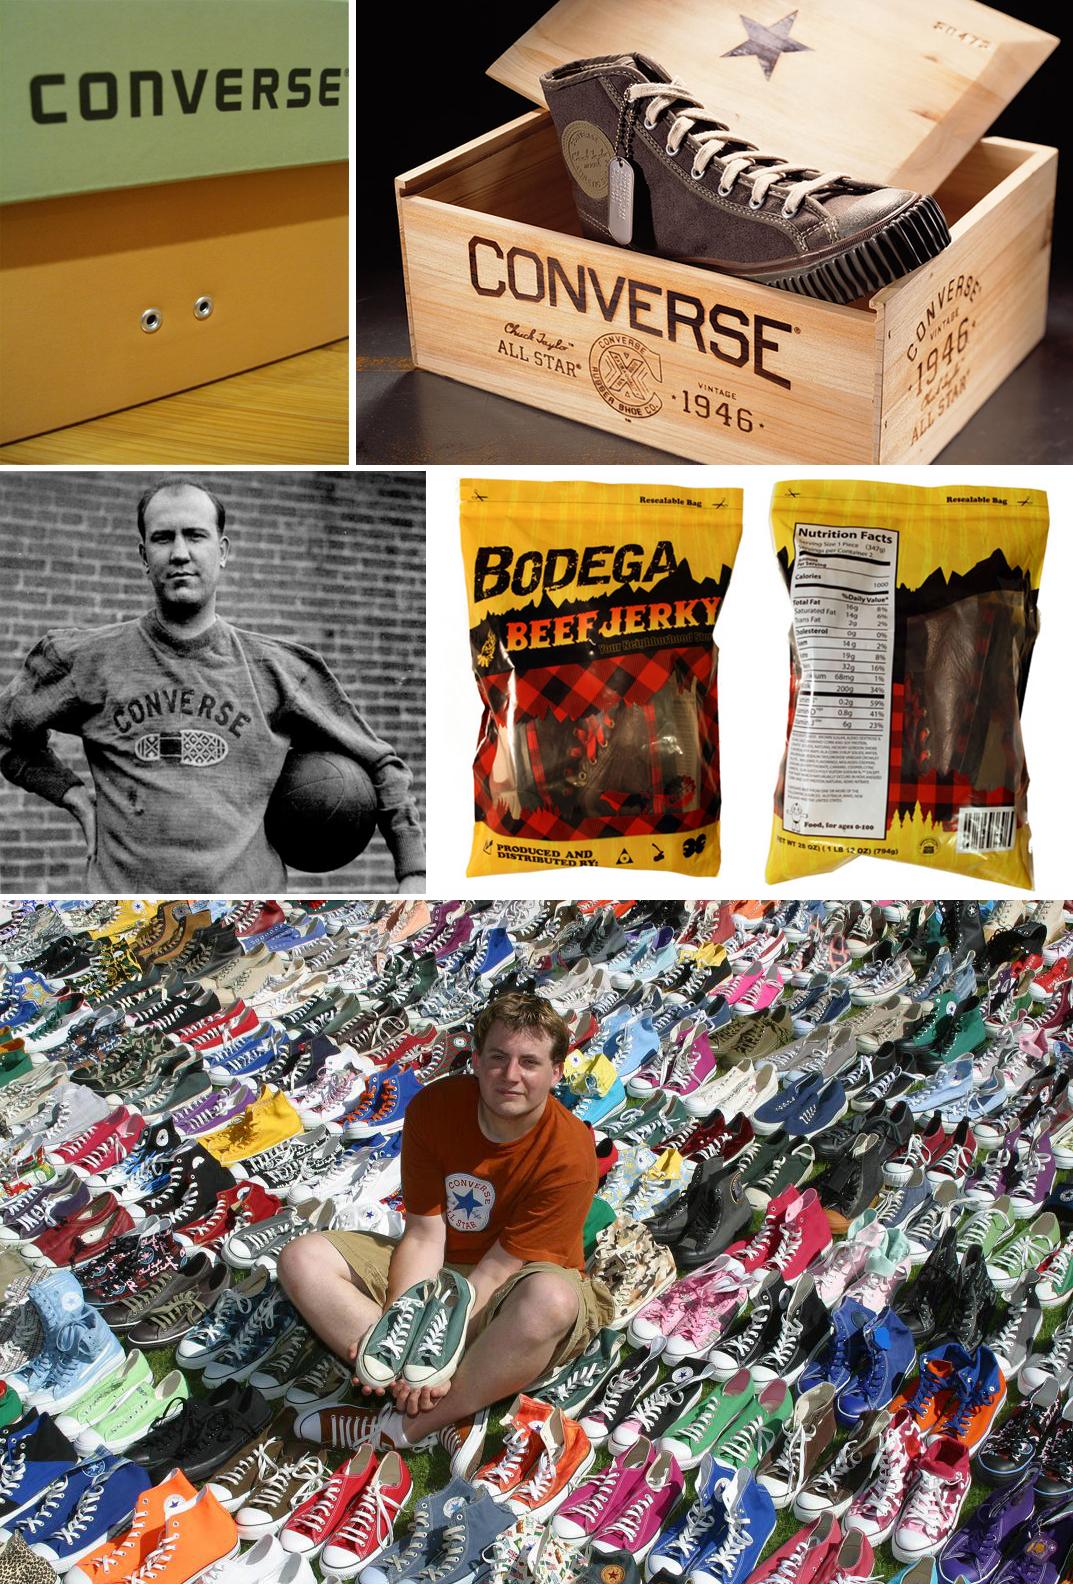 ConversePictures